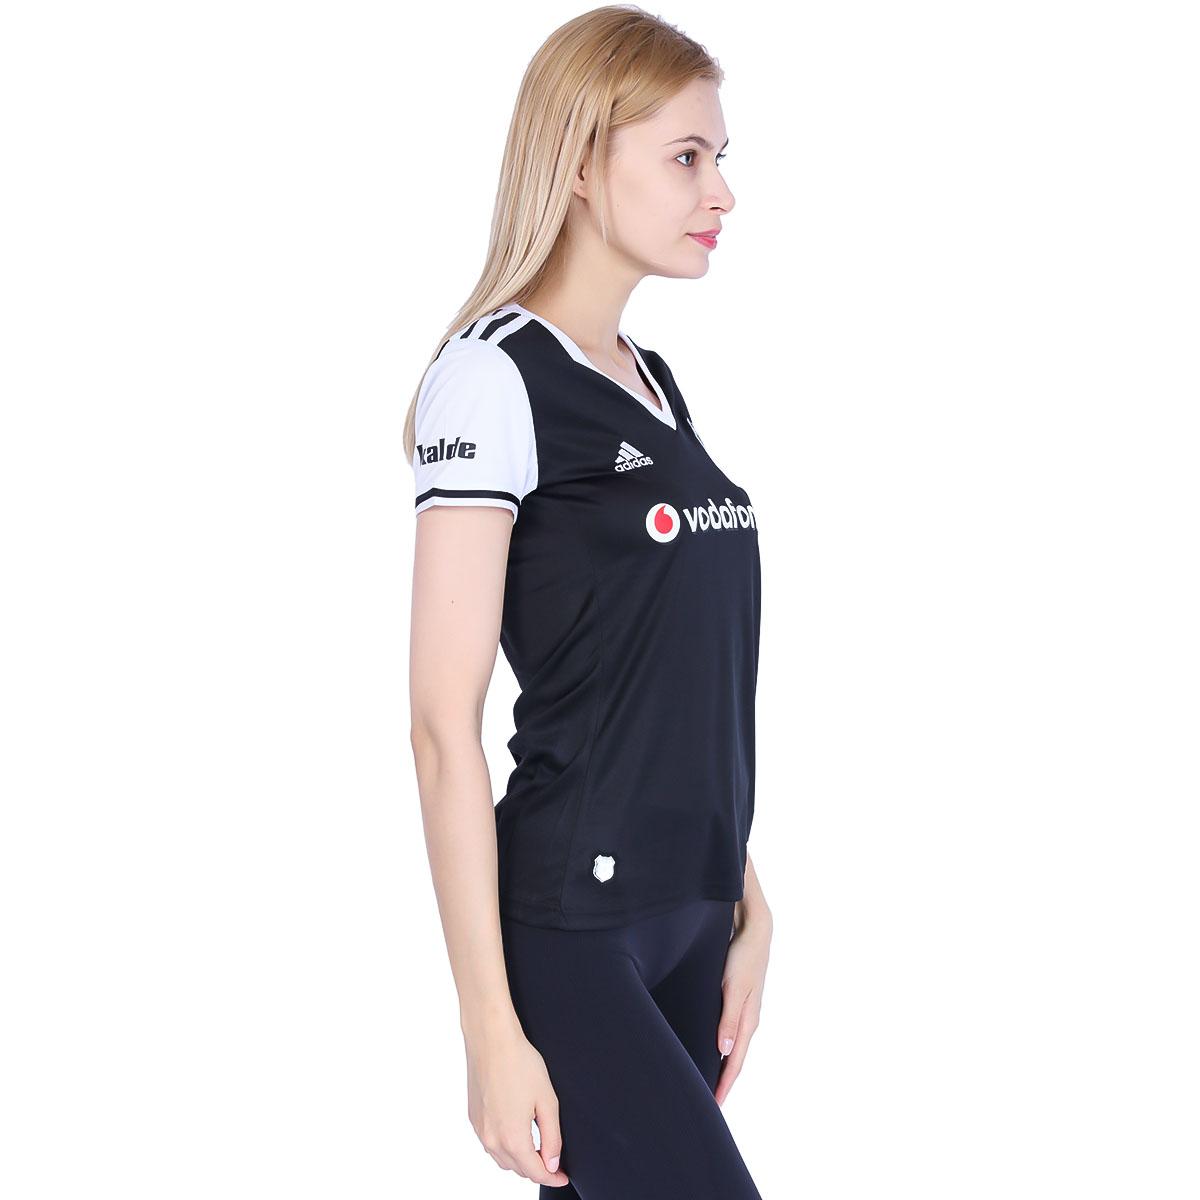 Beşiktaş Kadın Siyah Deplasman Forması